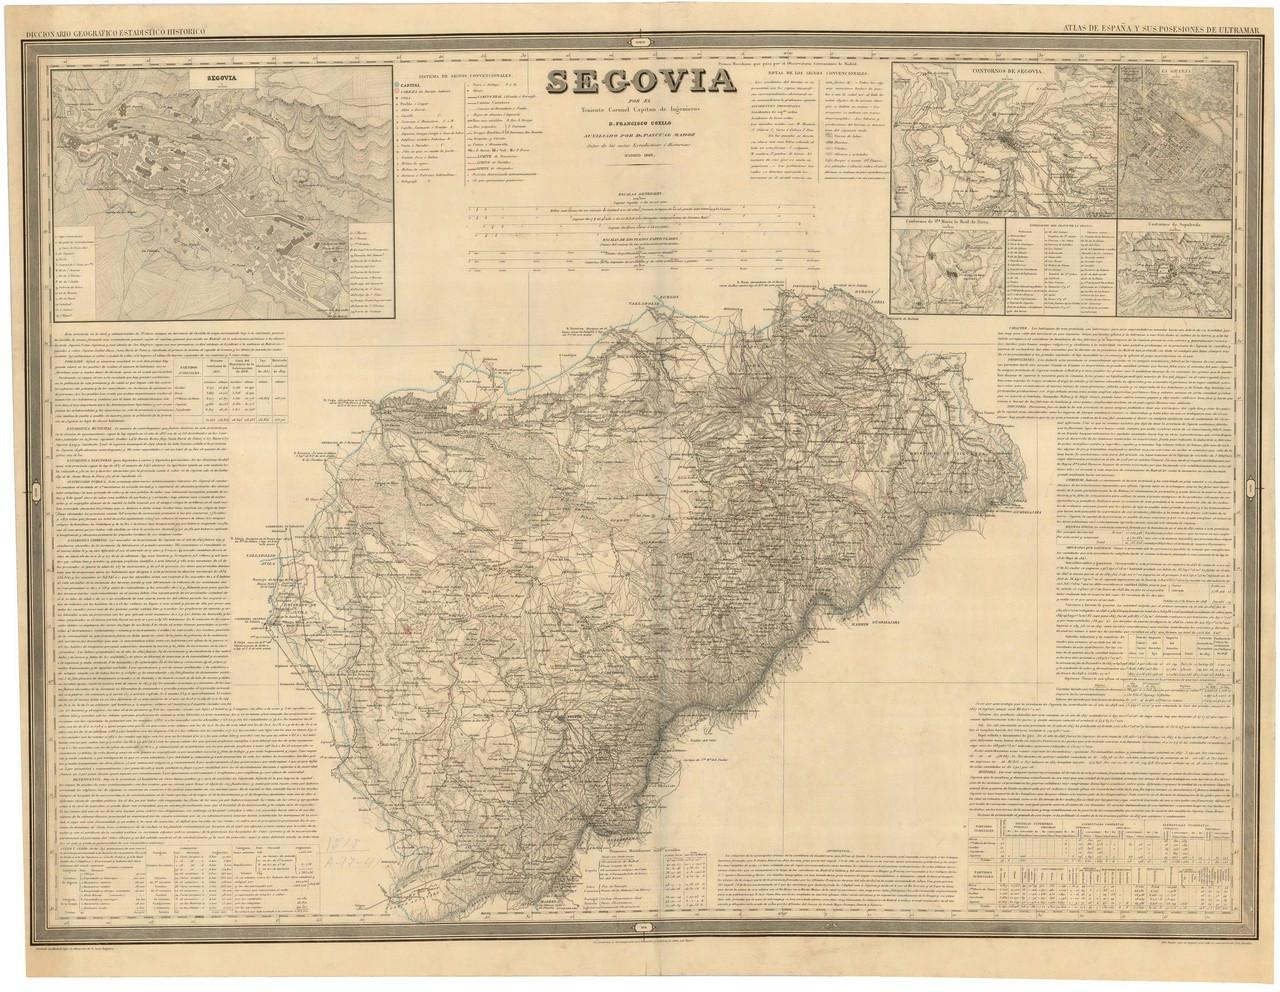 Detalle del plano de Segovia de Francisco Coello, 1849. 5.- ARCHIVO GENERAL MILITAR DE MADRID. Signatura SG 01-11.